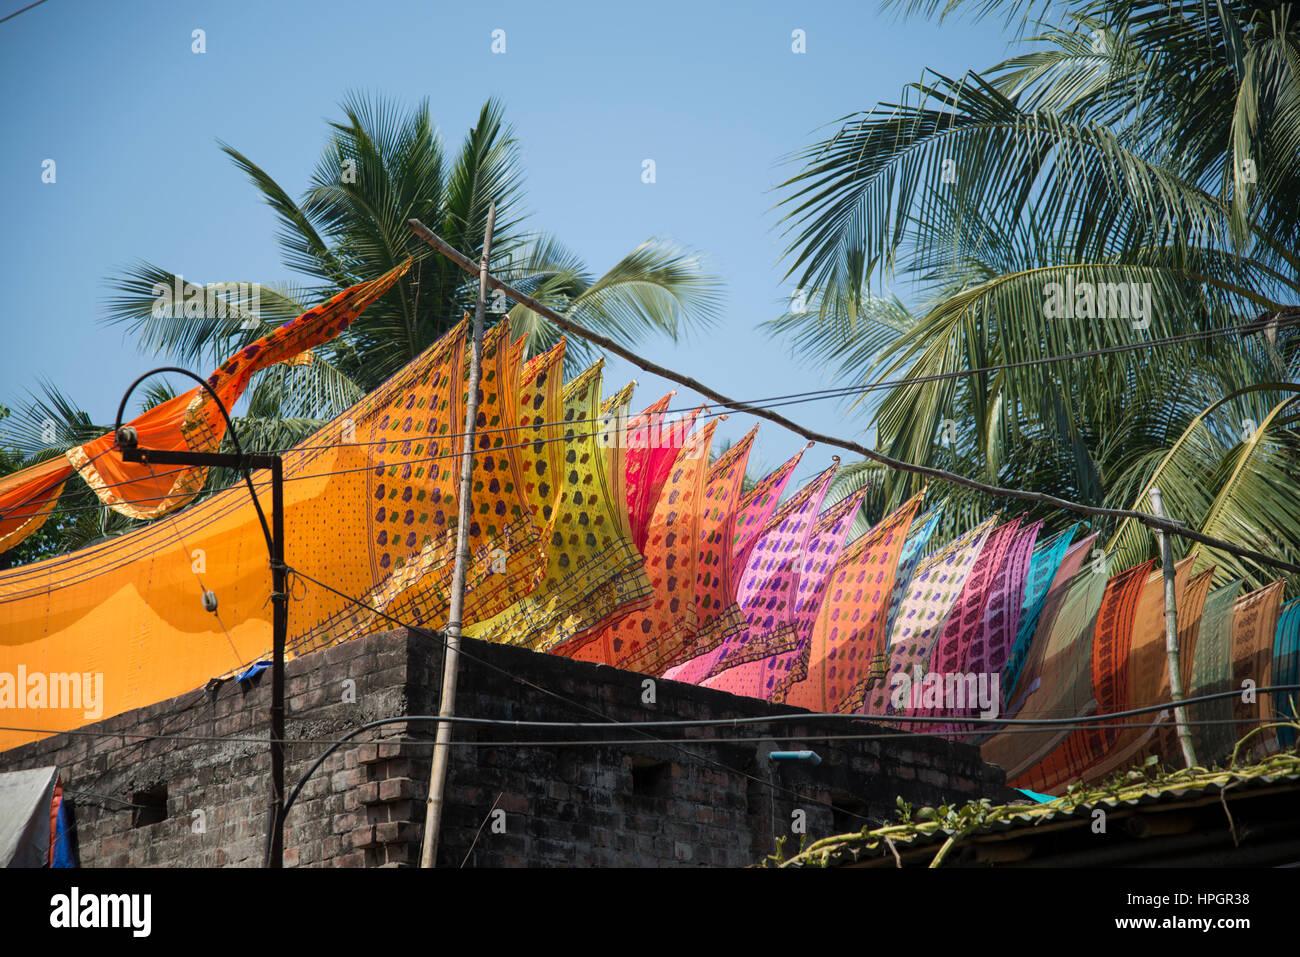 Newly made saris on washing line, Navadwipa, India. Stock Photo